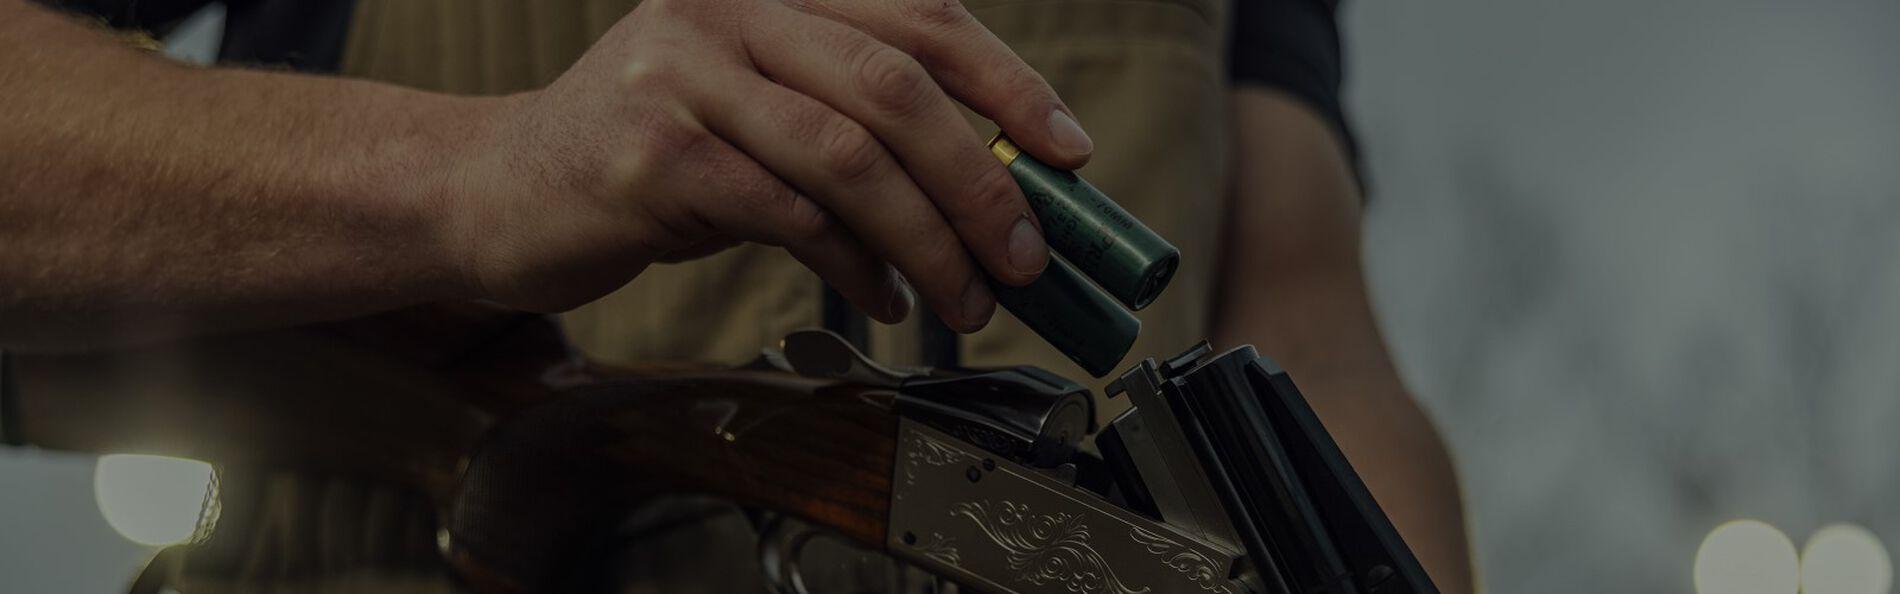 Shotshells being loaded into a shotgun